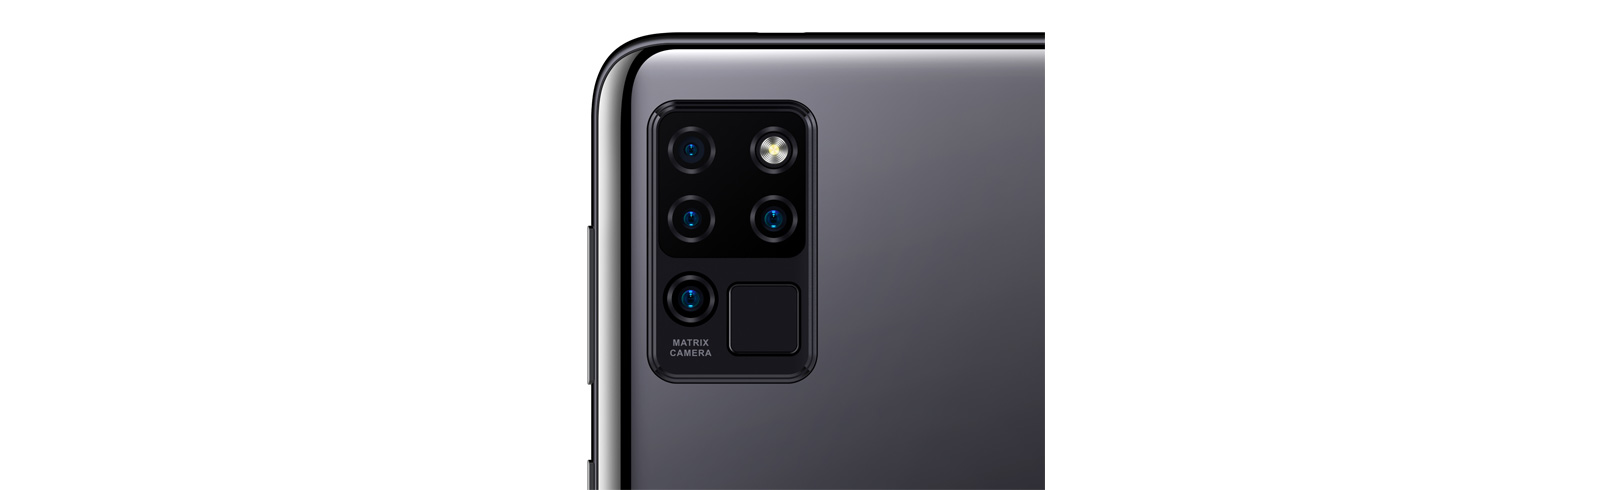 Oukitel C21 teased with a quad-camera matrix camera